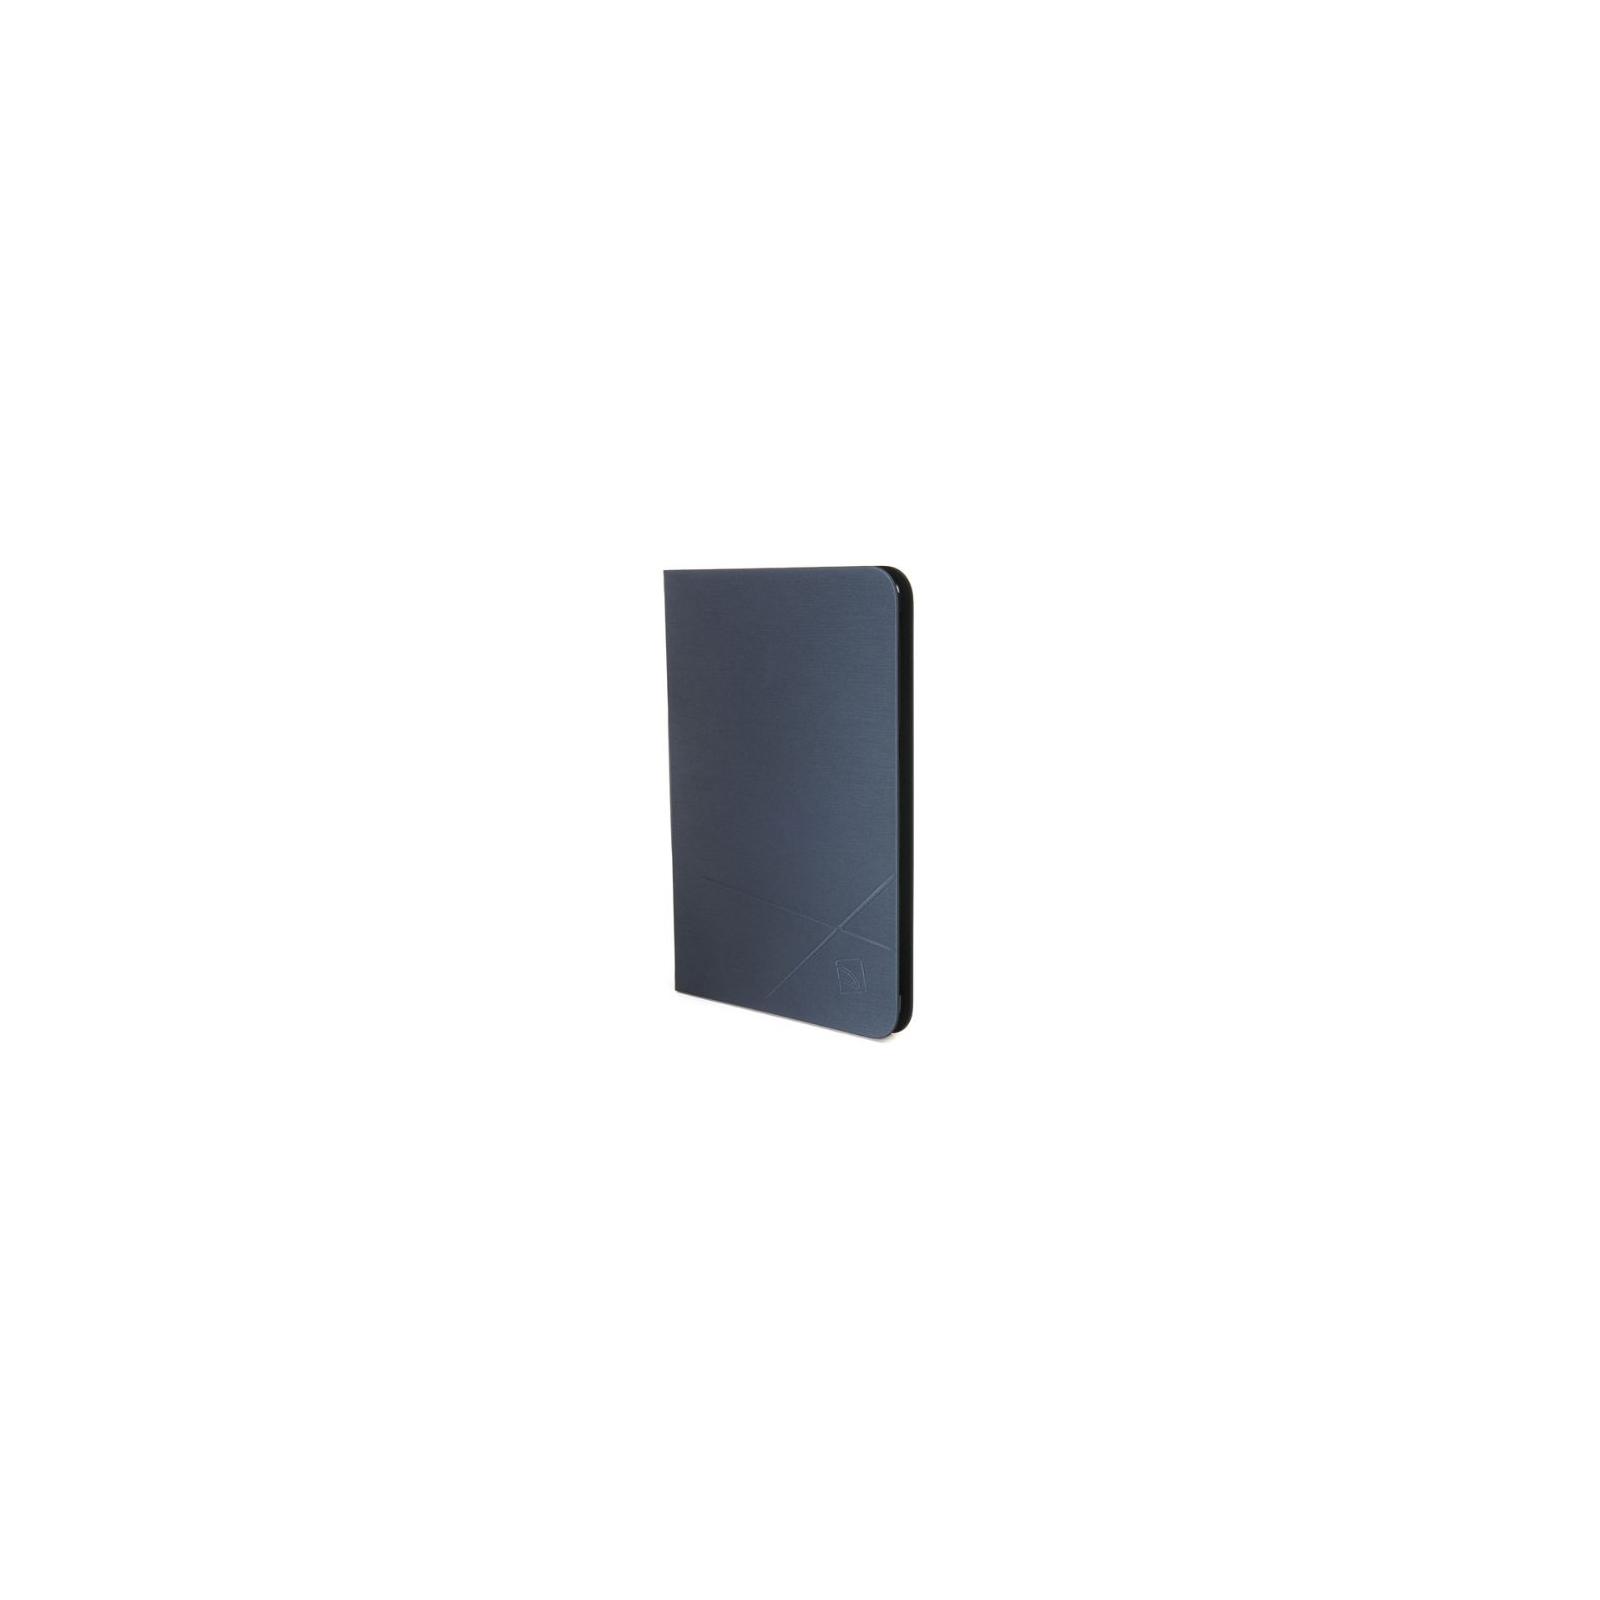 Чехол для планшета Tucano iPad Air Filo Blue (IPD5FI-BS) изображение 2